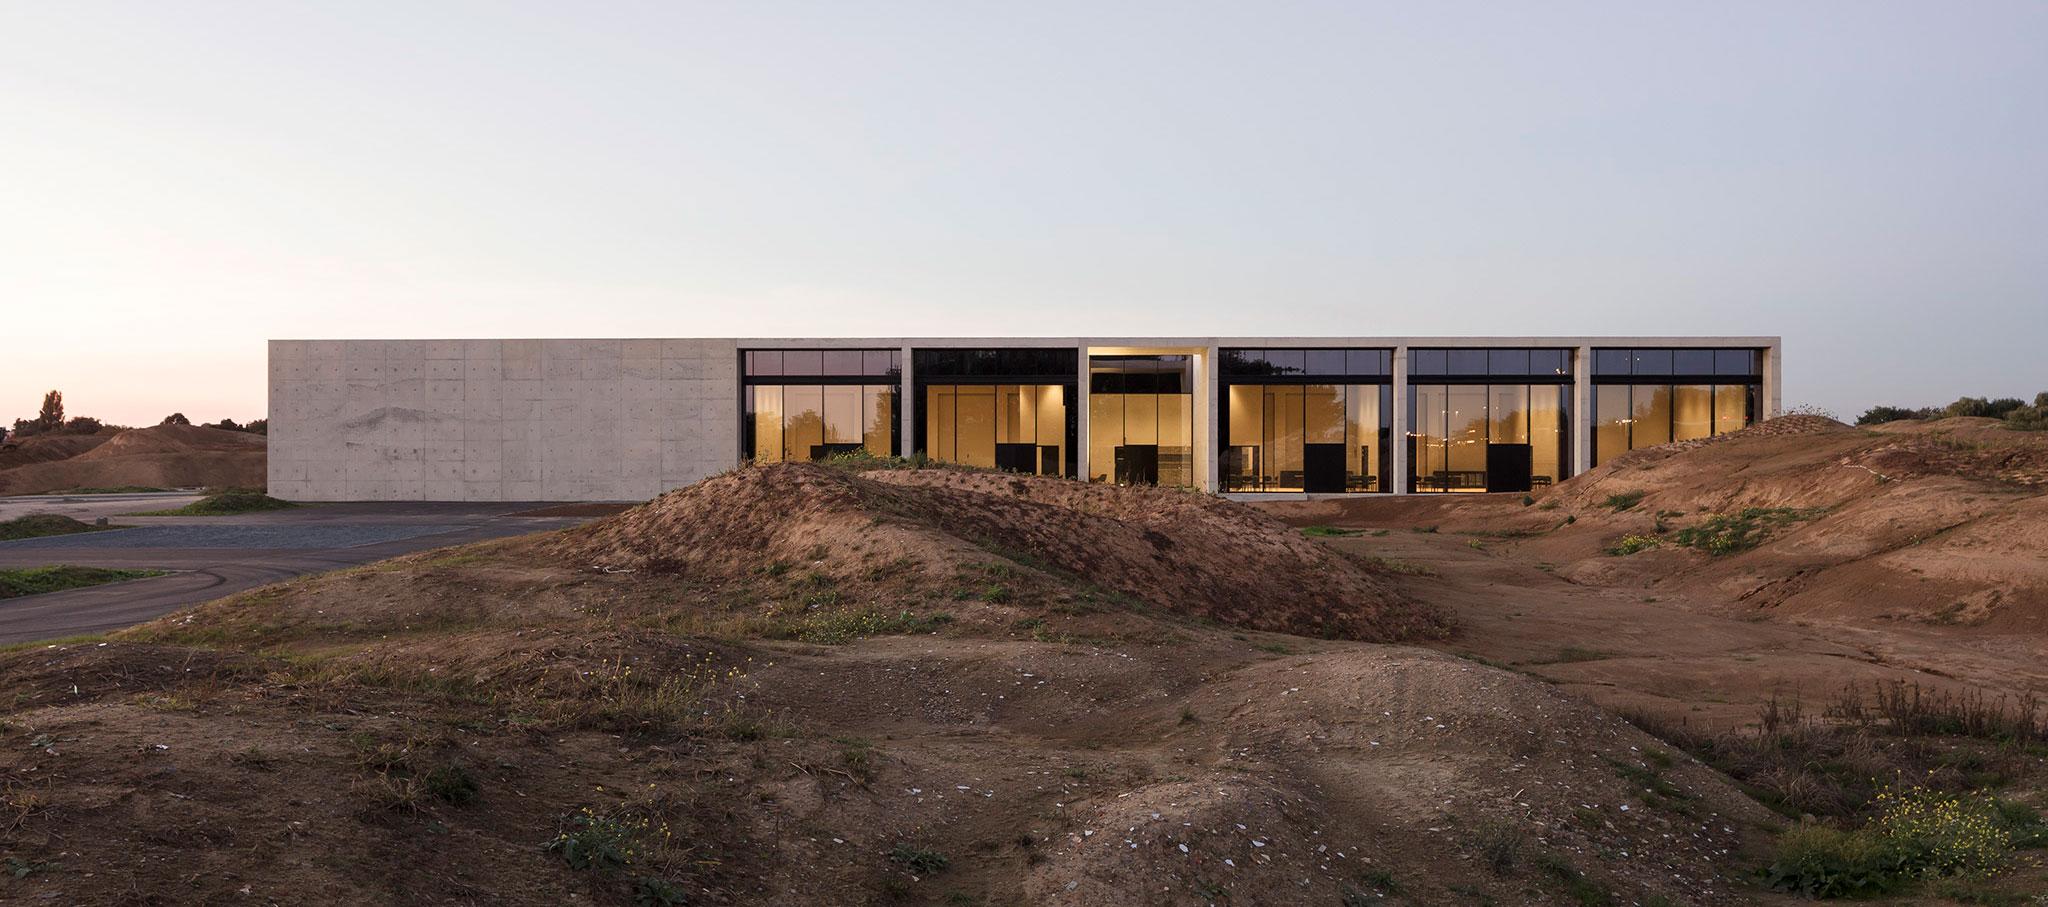 Crematorio Siesegem por KAAN Architecten. Fotografía por Sebastian van Damme